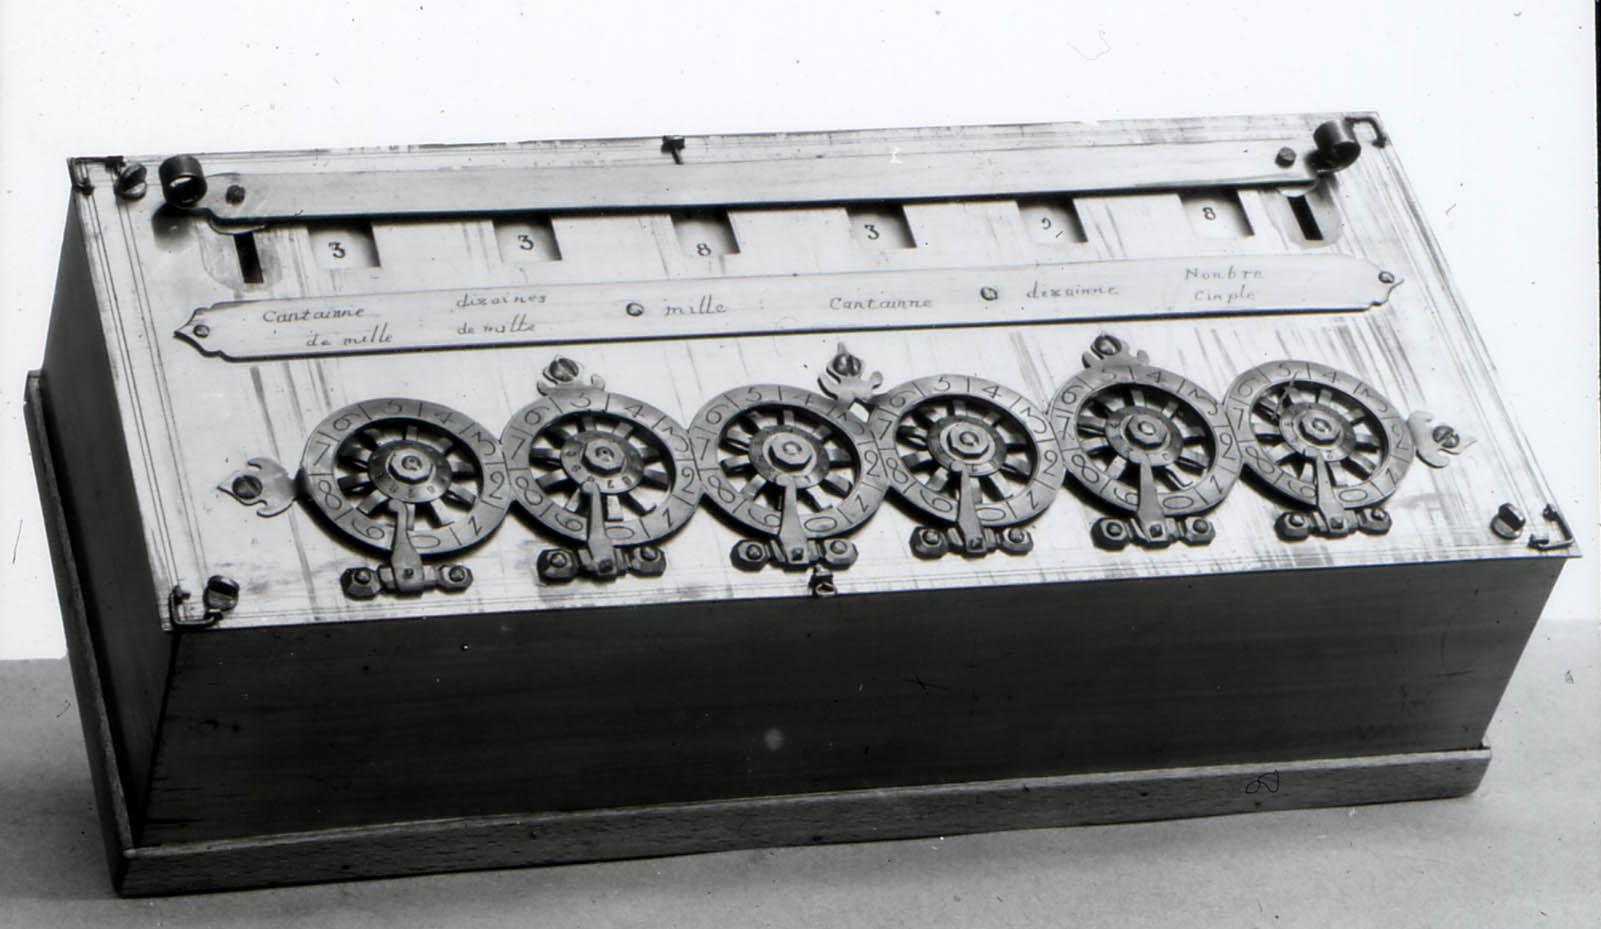 pascals adding machine